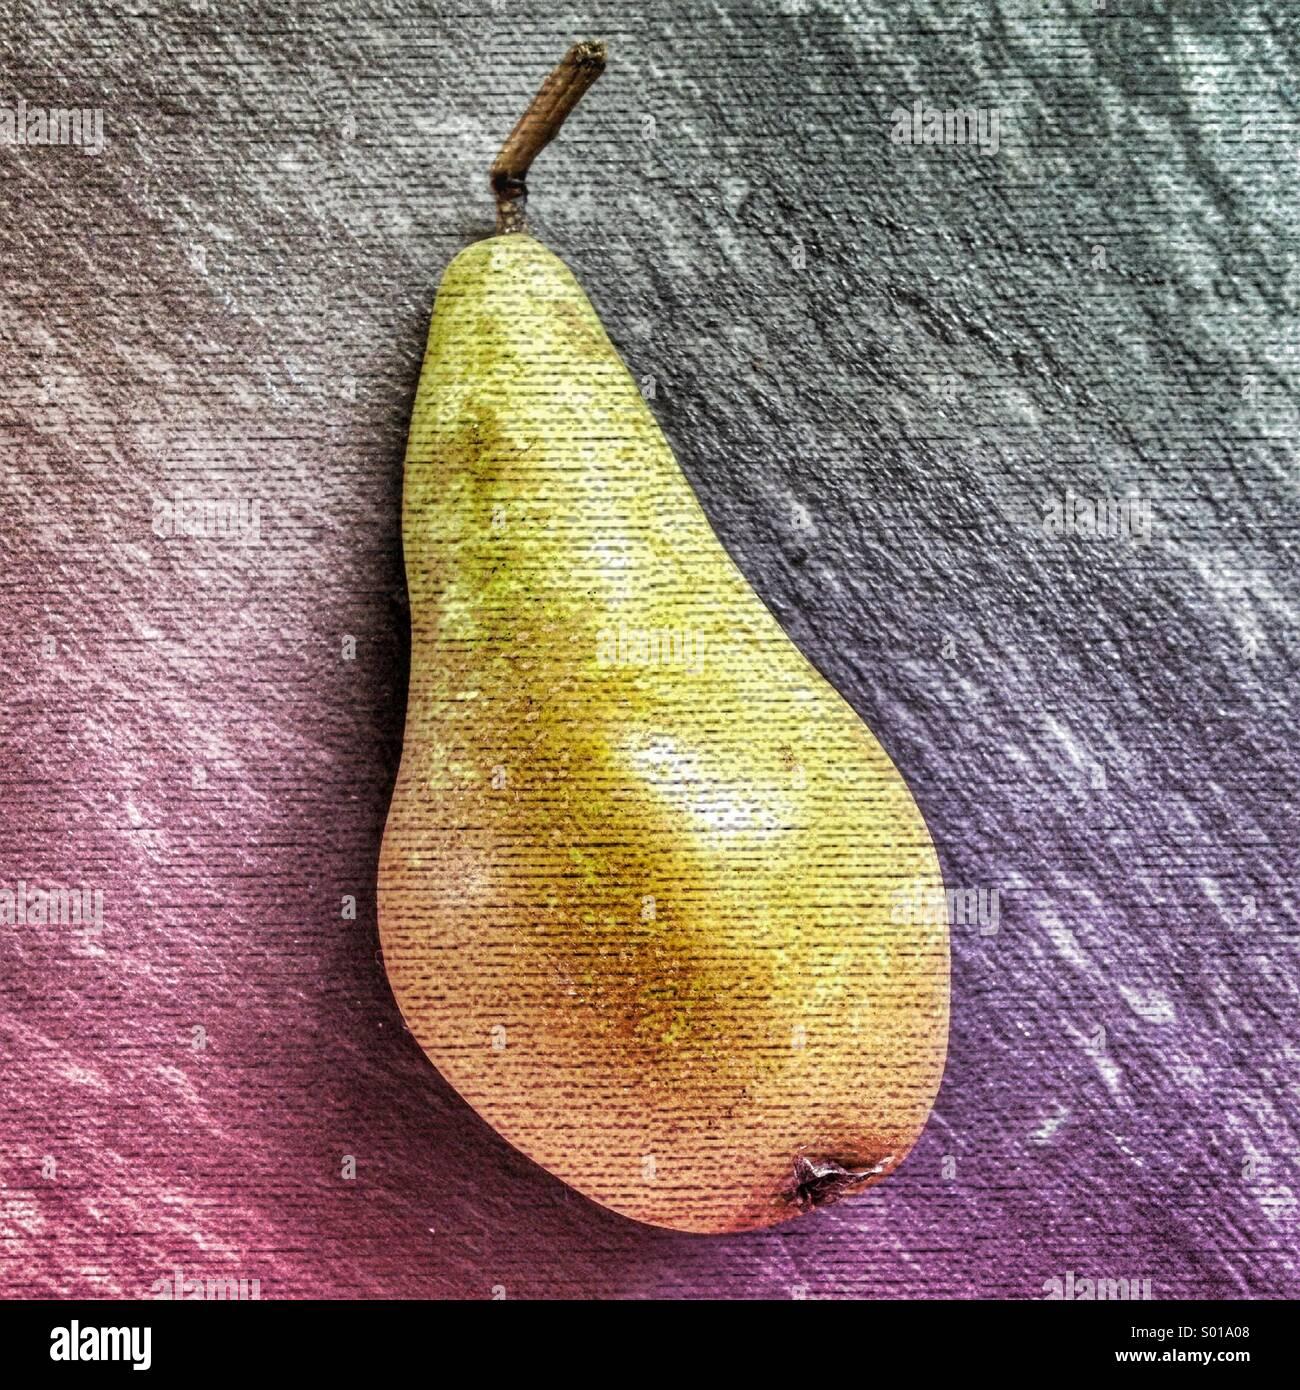 Pear Art Stock Photos & Pear Art Stock Images - Alamy